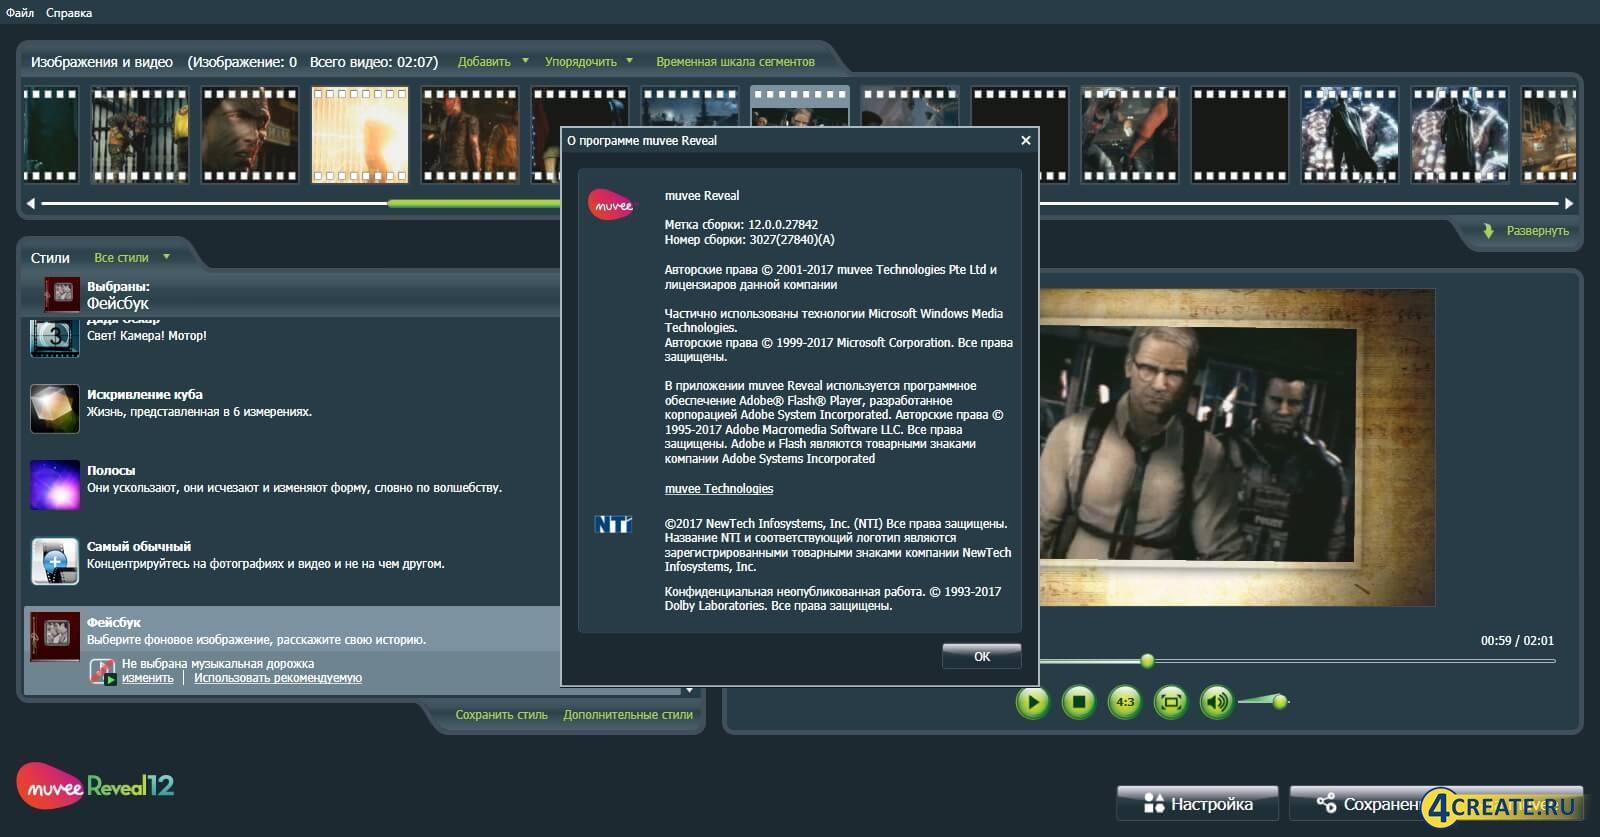 muvee Reveal 12 (Скриншот 1)